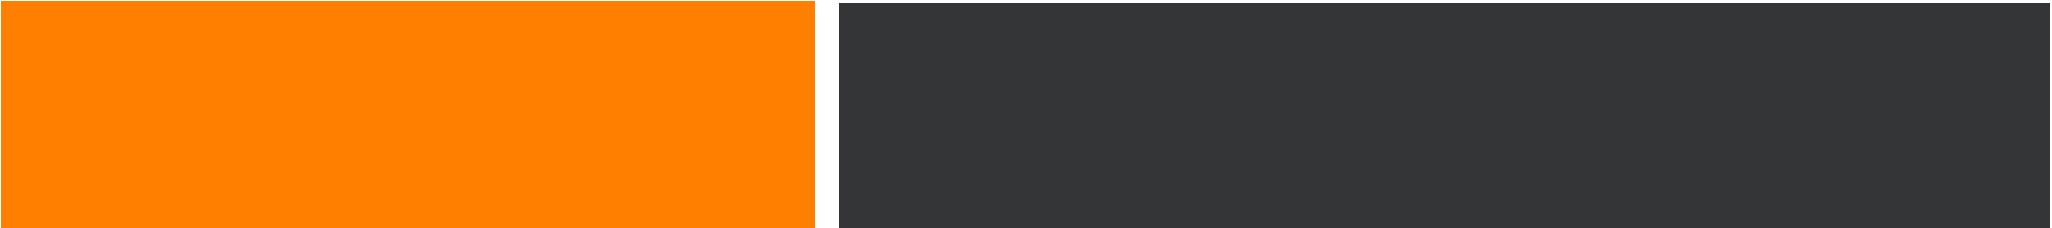 Brand Networks, Inc. Company Logo